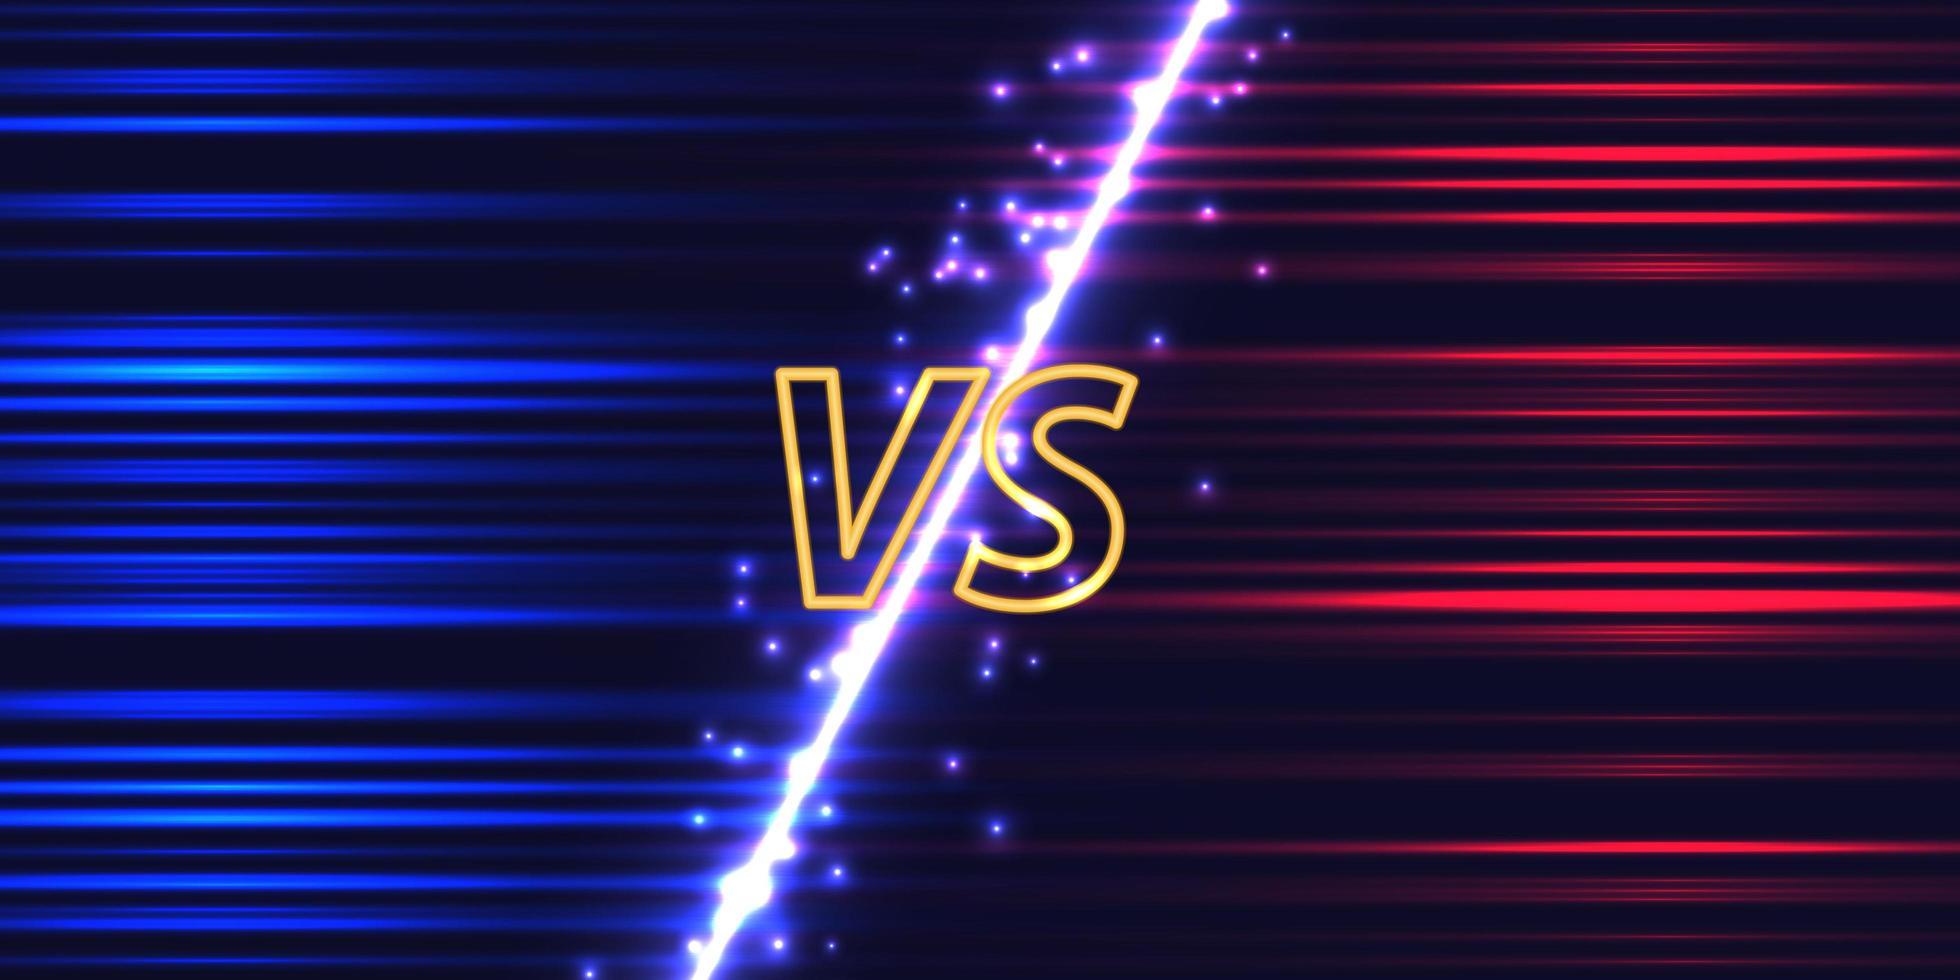 versus pantalla con brillo de neón vector